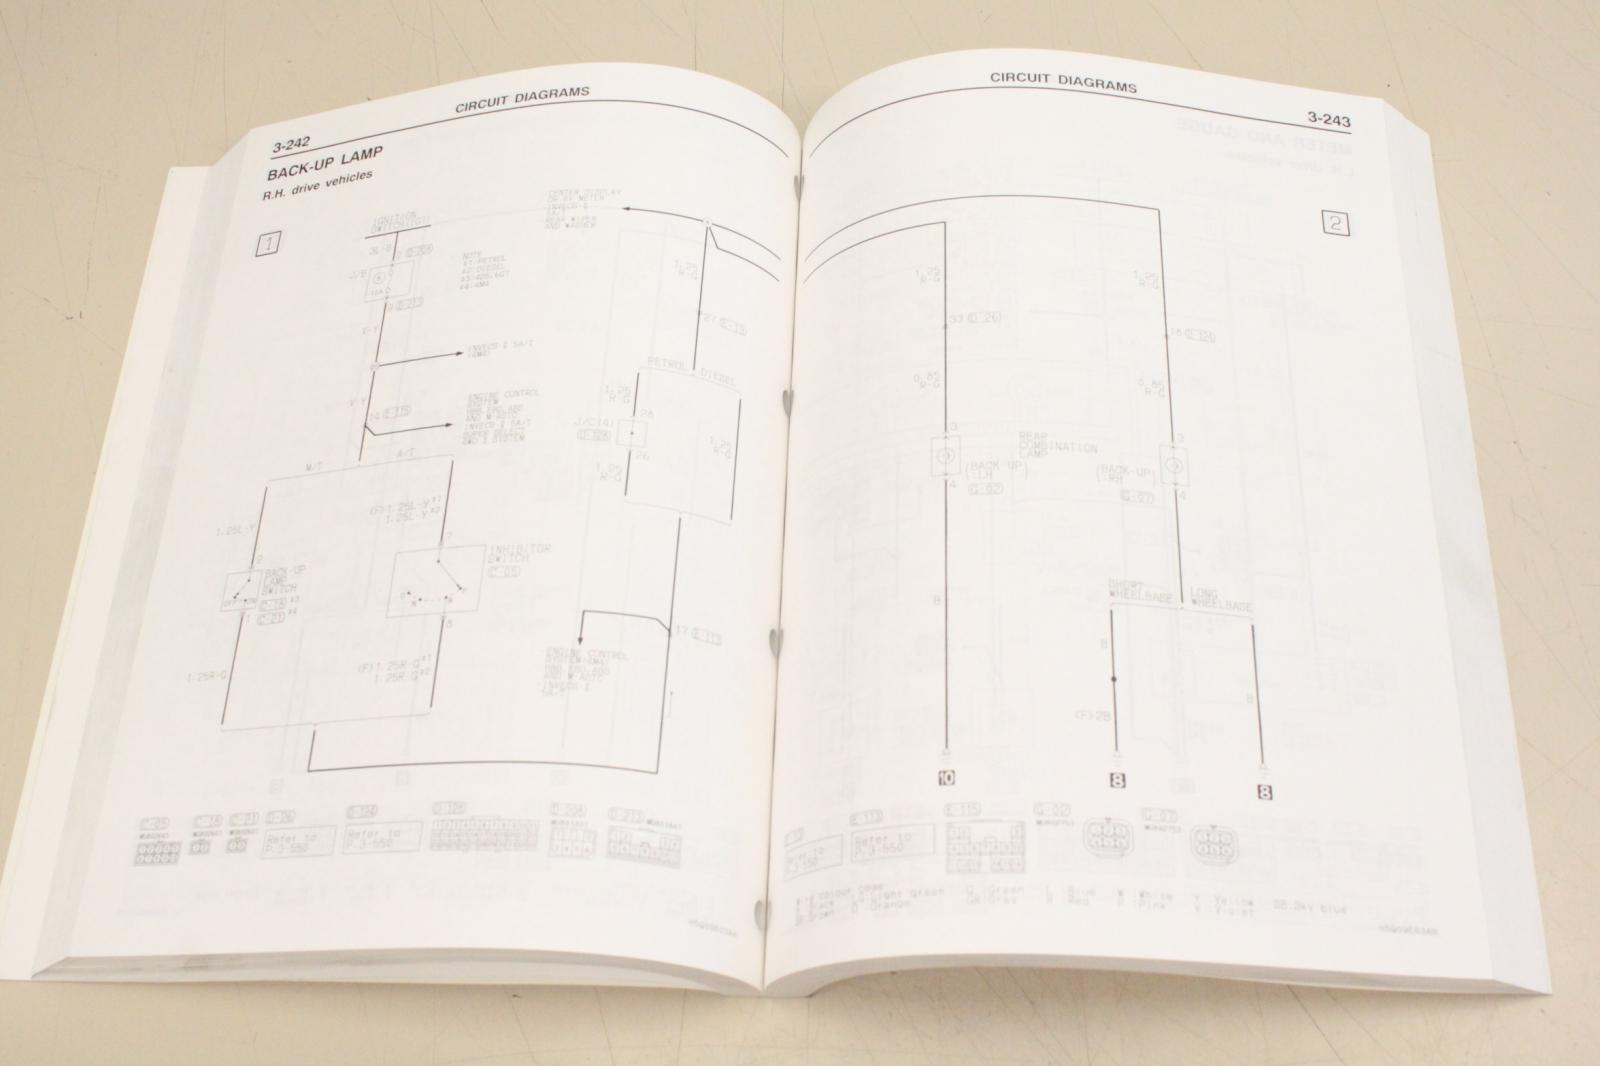 Mitsubishi Pajero 2005 Werkstatthandbuch Electrical Writing Phje0001 Wiring Diagram Index 53 Automotive Circuit D